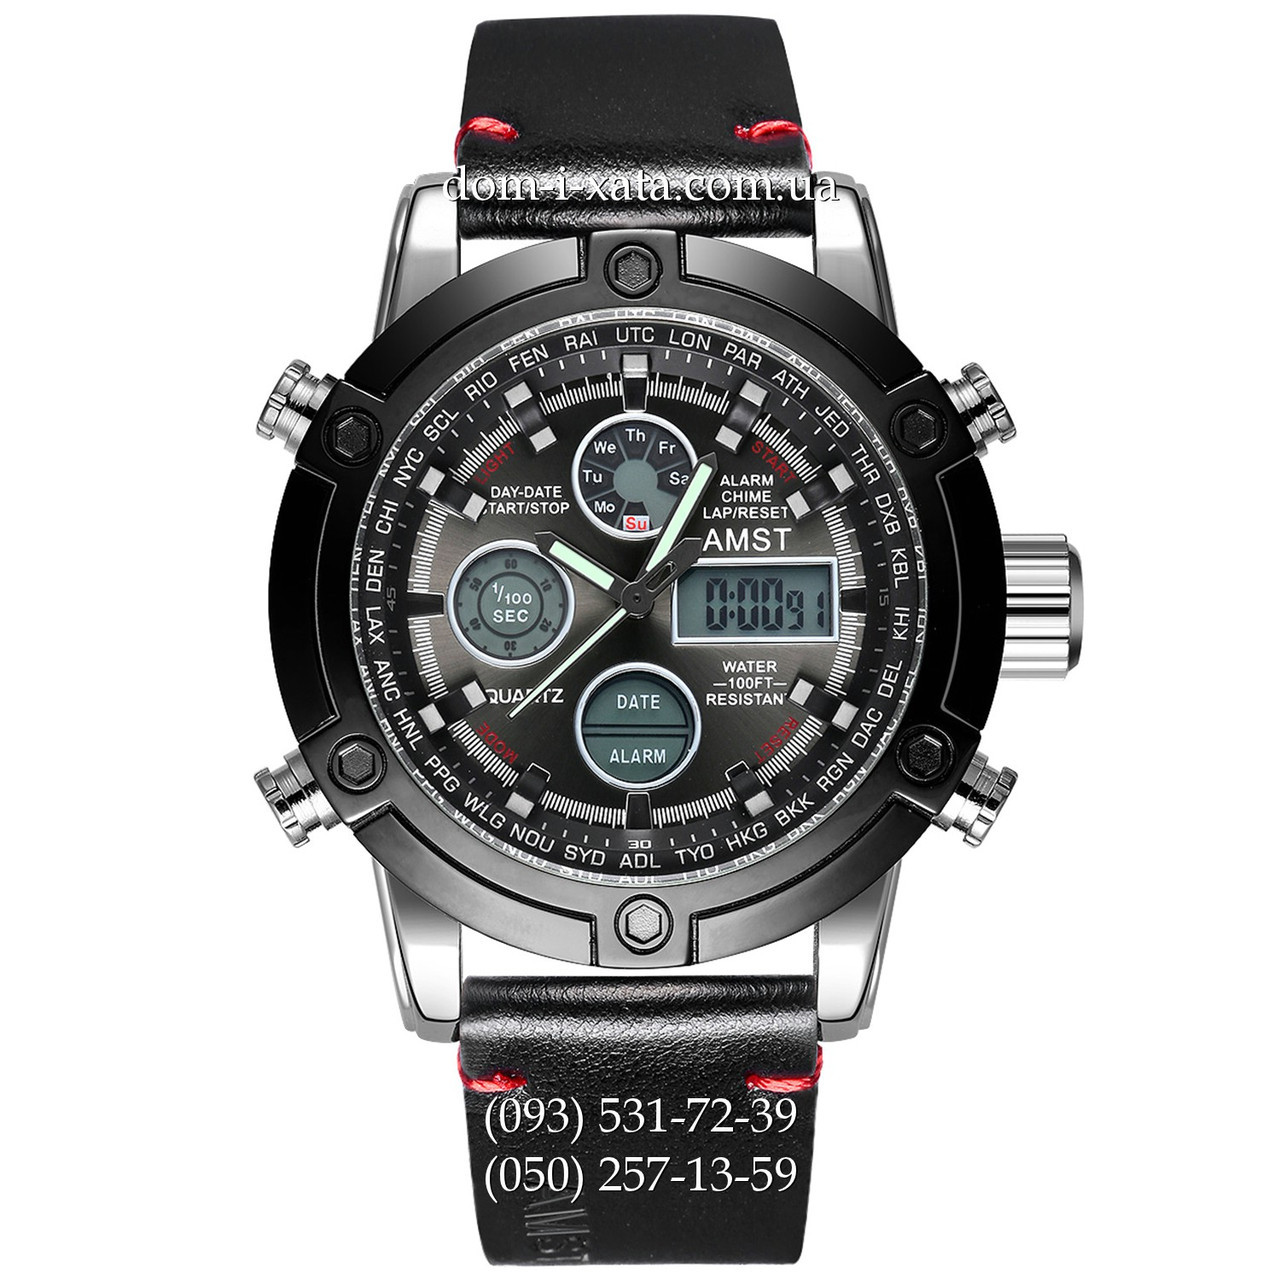 Армейские часы AMST 3022 Silver-Black Smooth Wristband, кварцевые, противоударные, армейские часы АМСТ, реплика отличное качество!